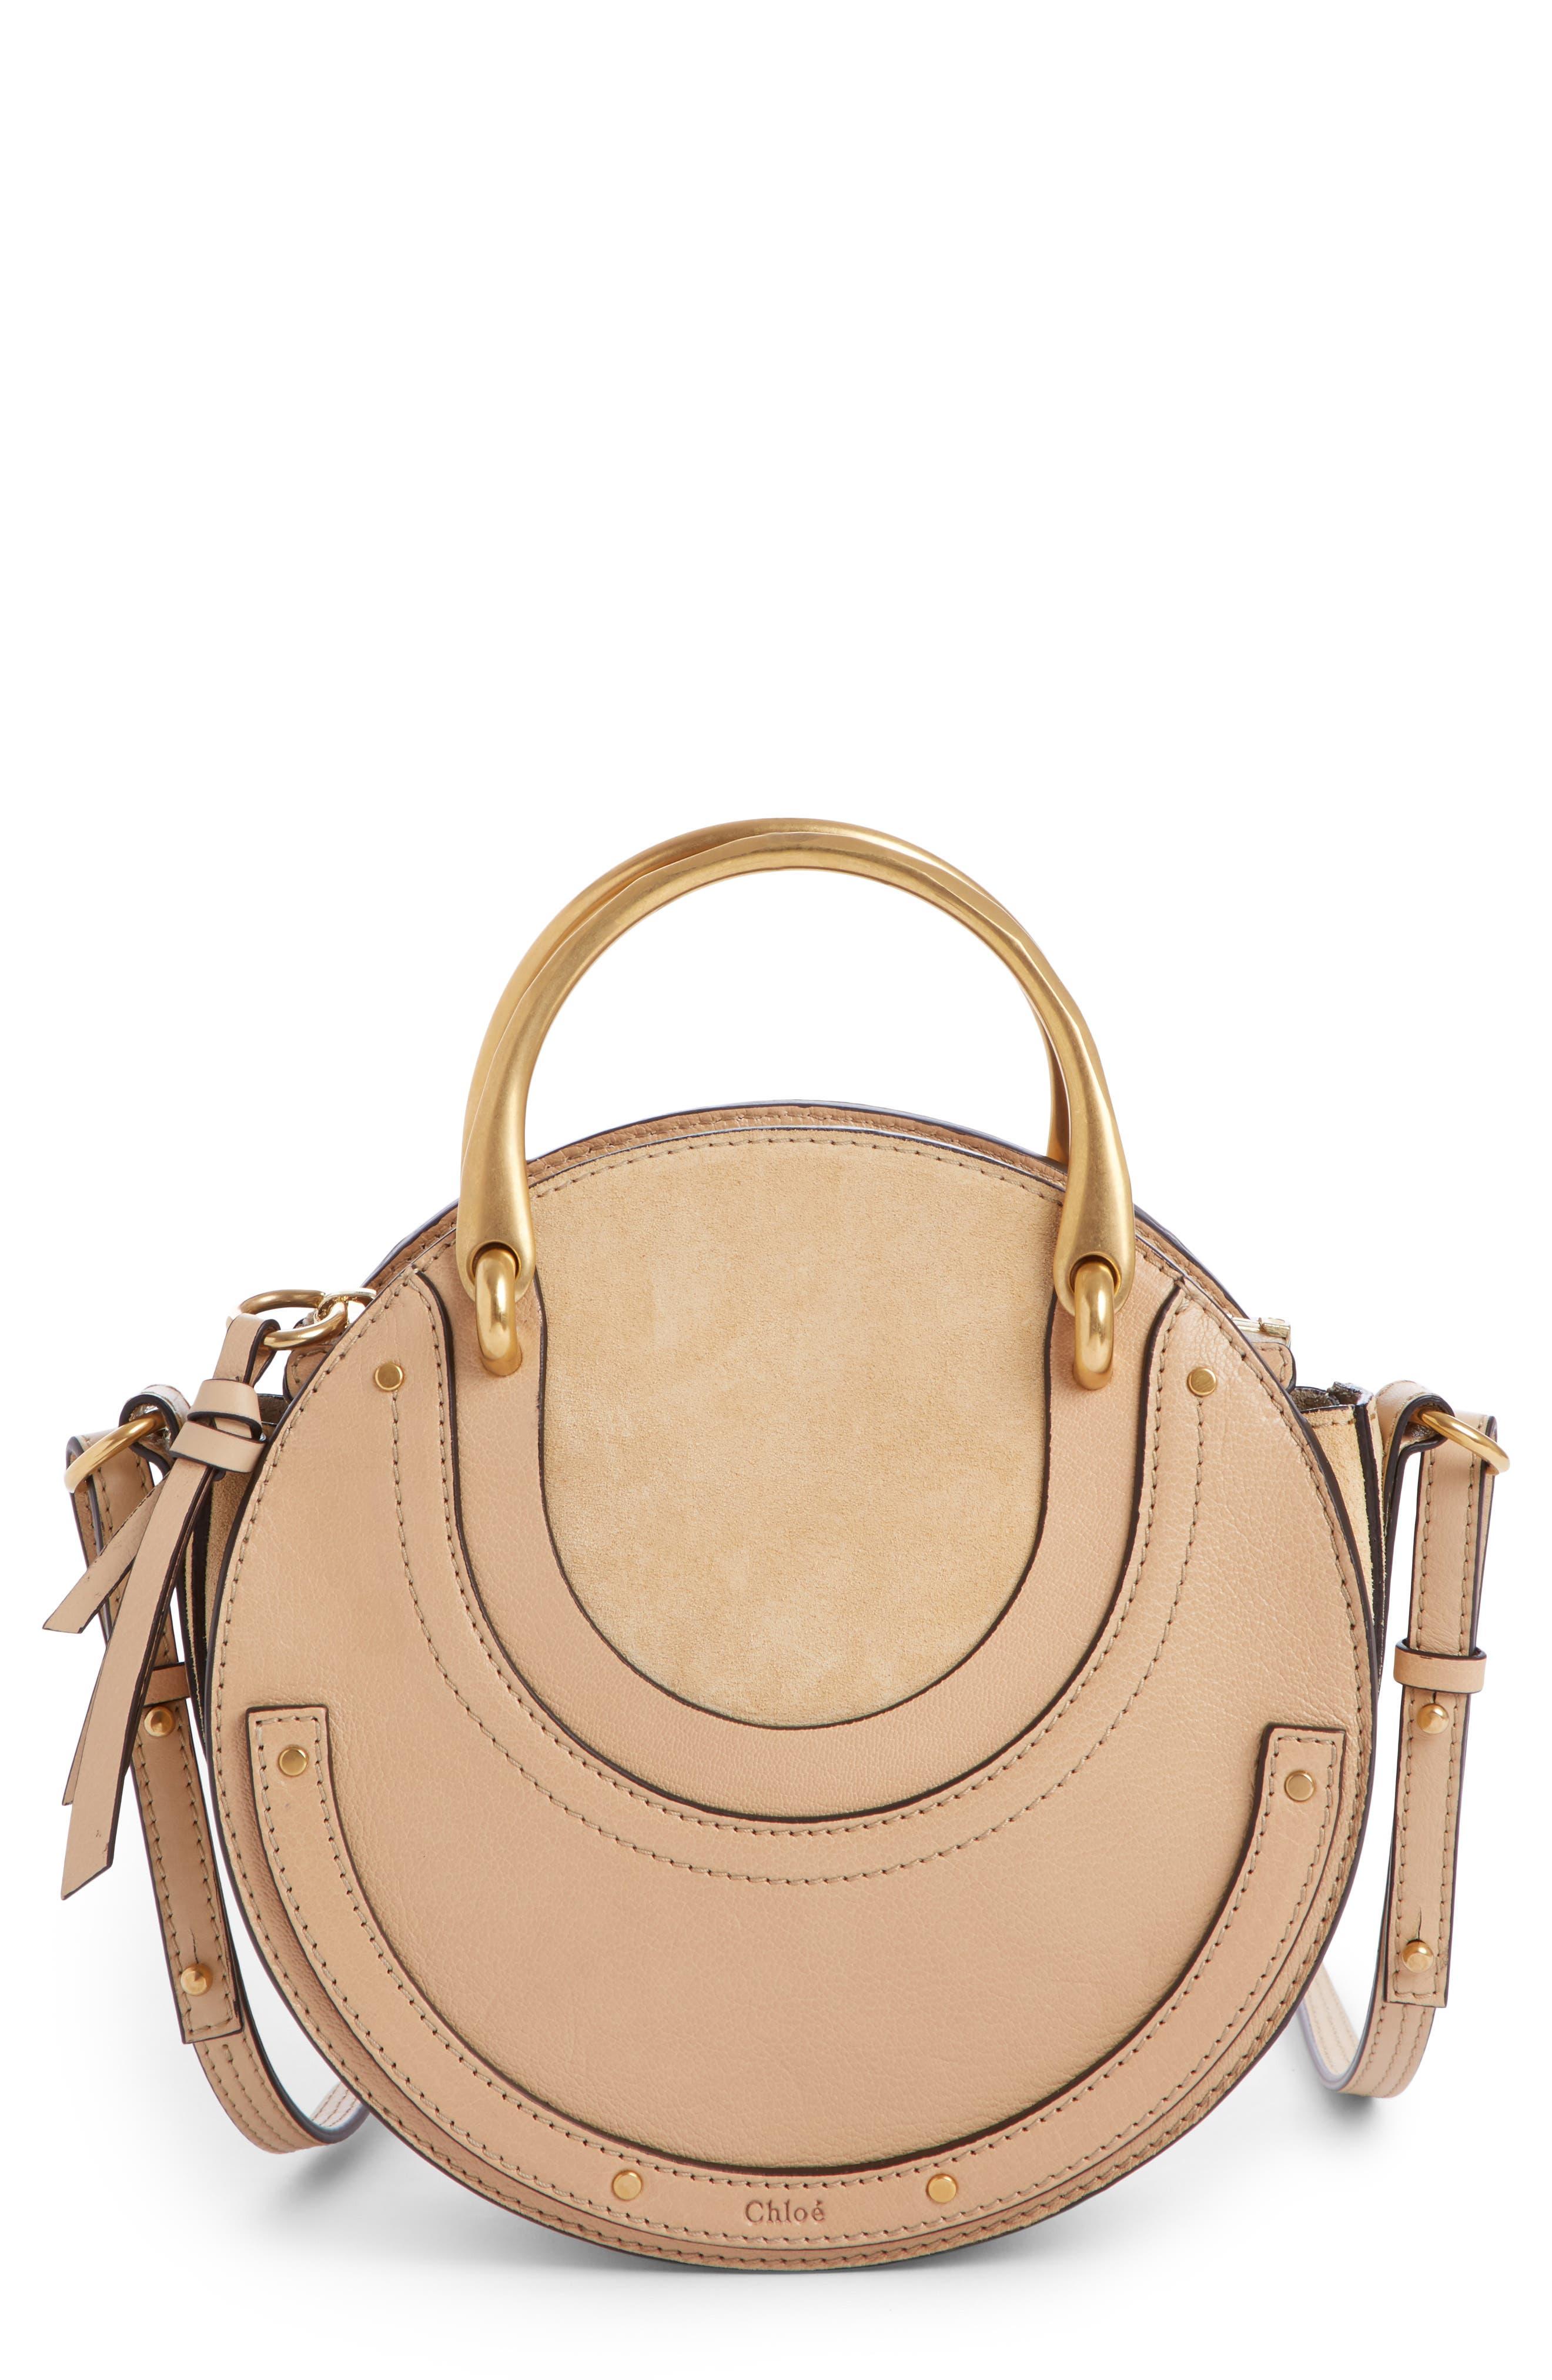 Main Image - Chloé Pixie Leather Crossbody Bag